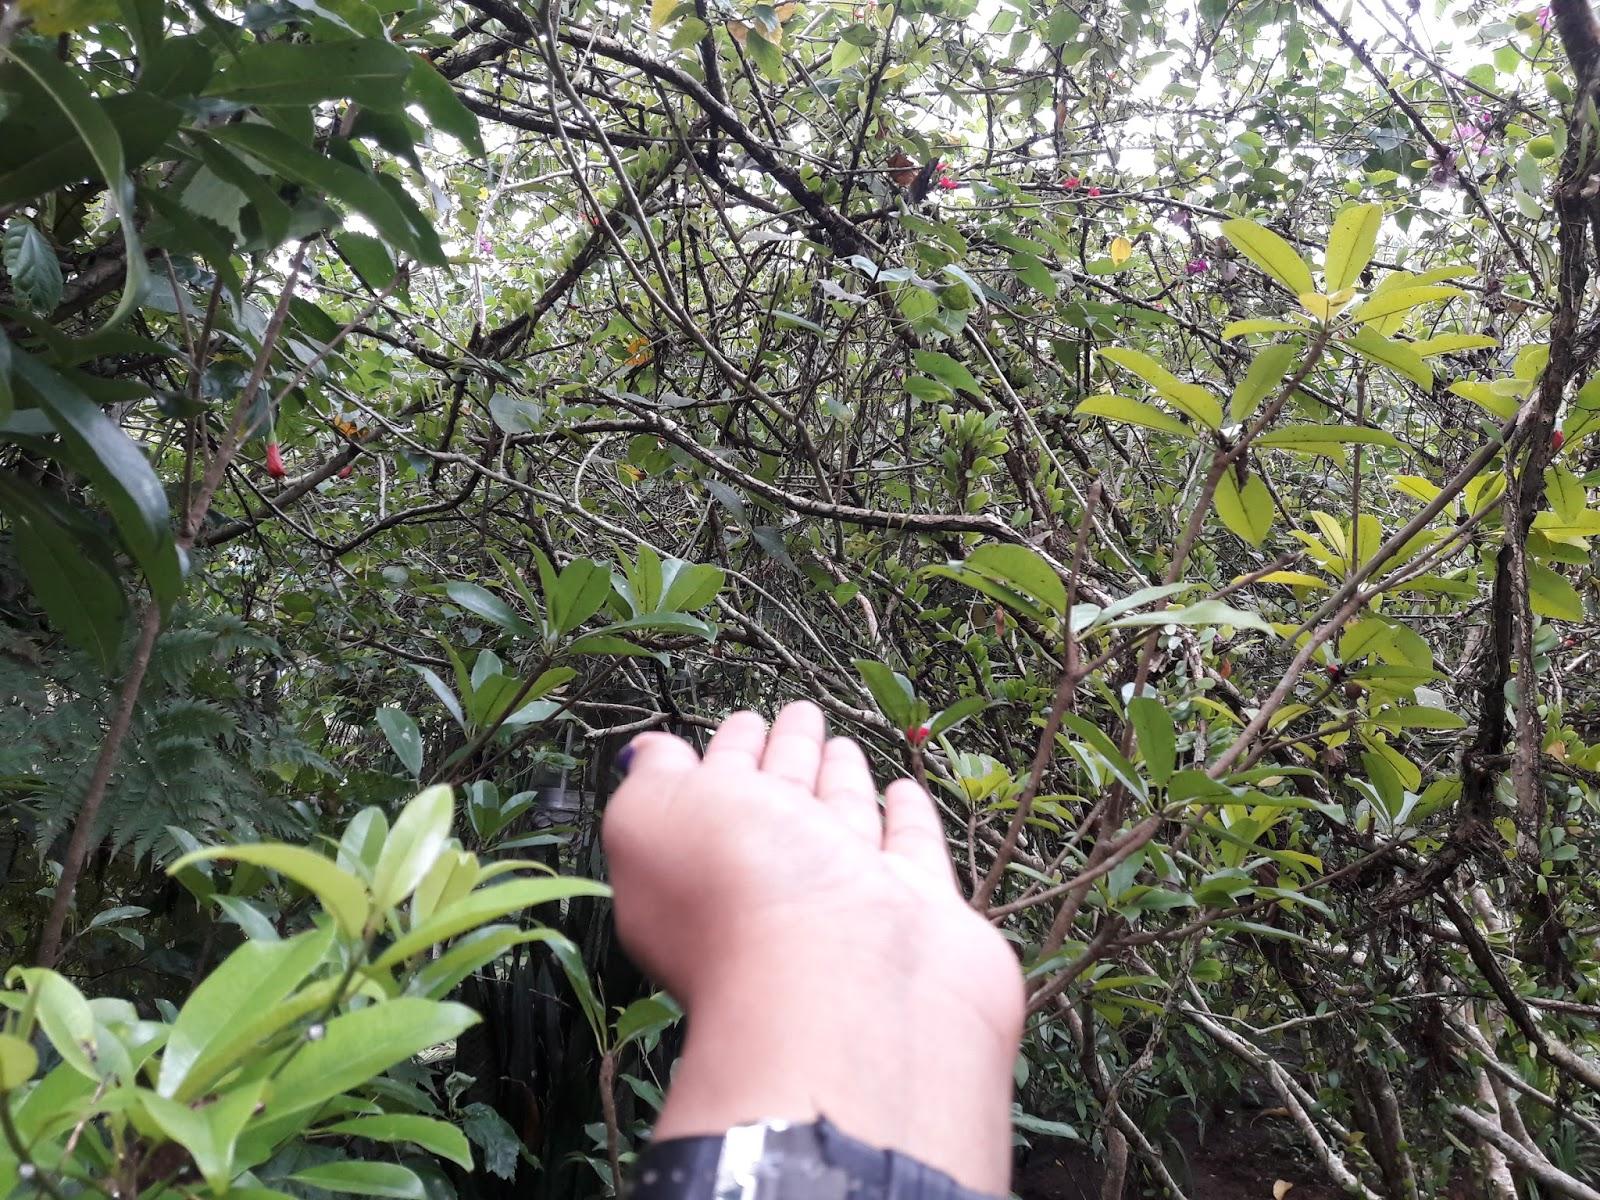 Objek Wisata Lokasi Harga Tiket Taman Kupu Butterfly Park Masuk